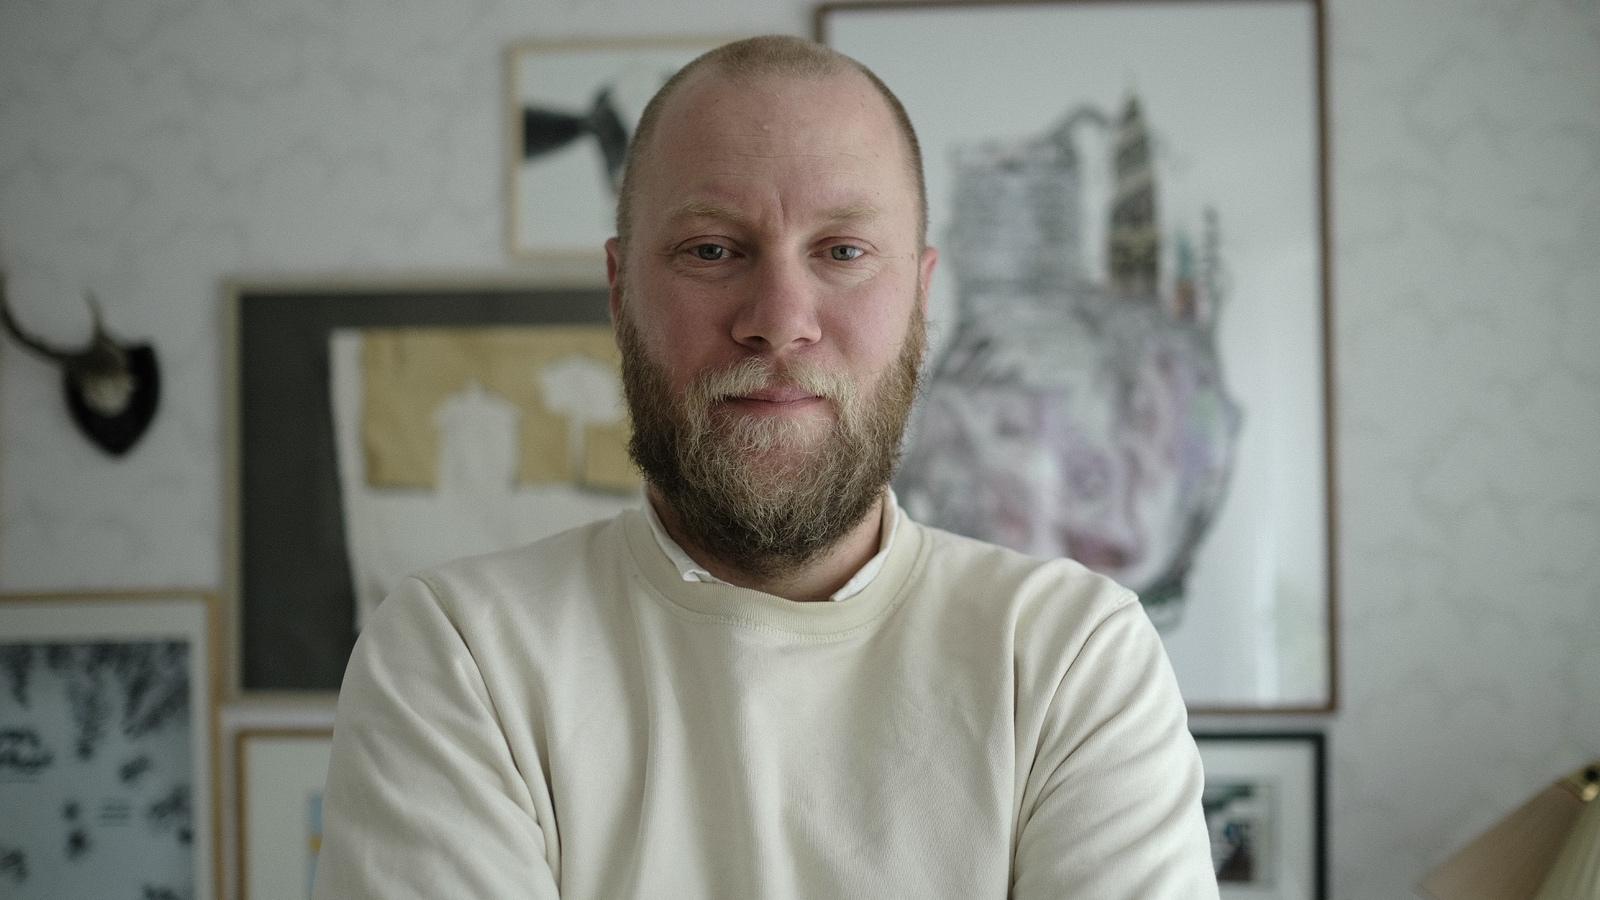 Jimmy Olsson